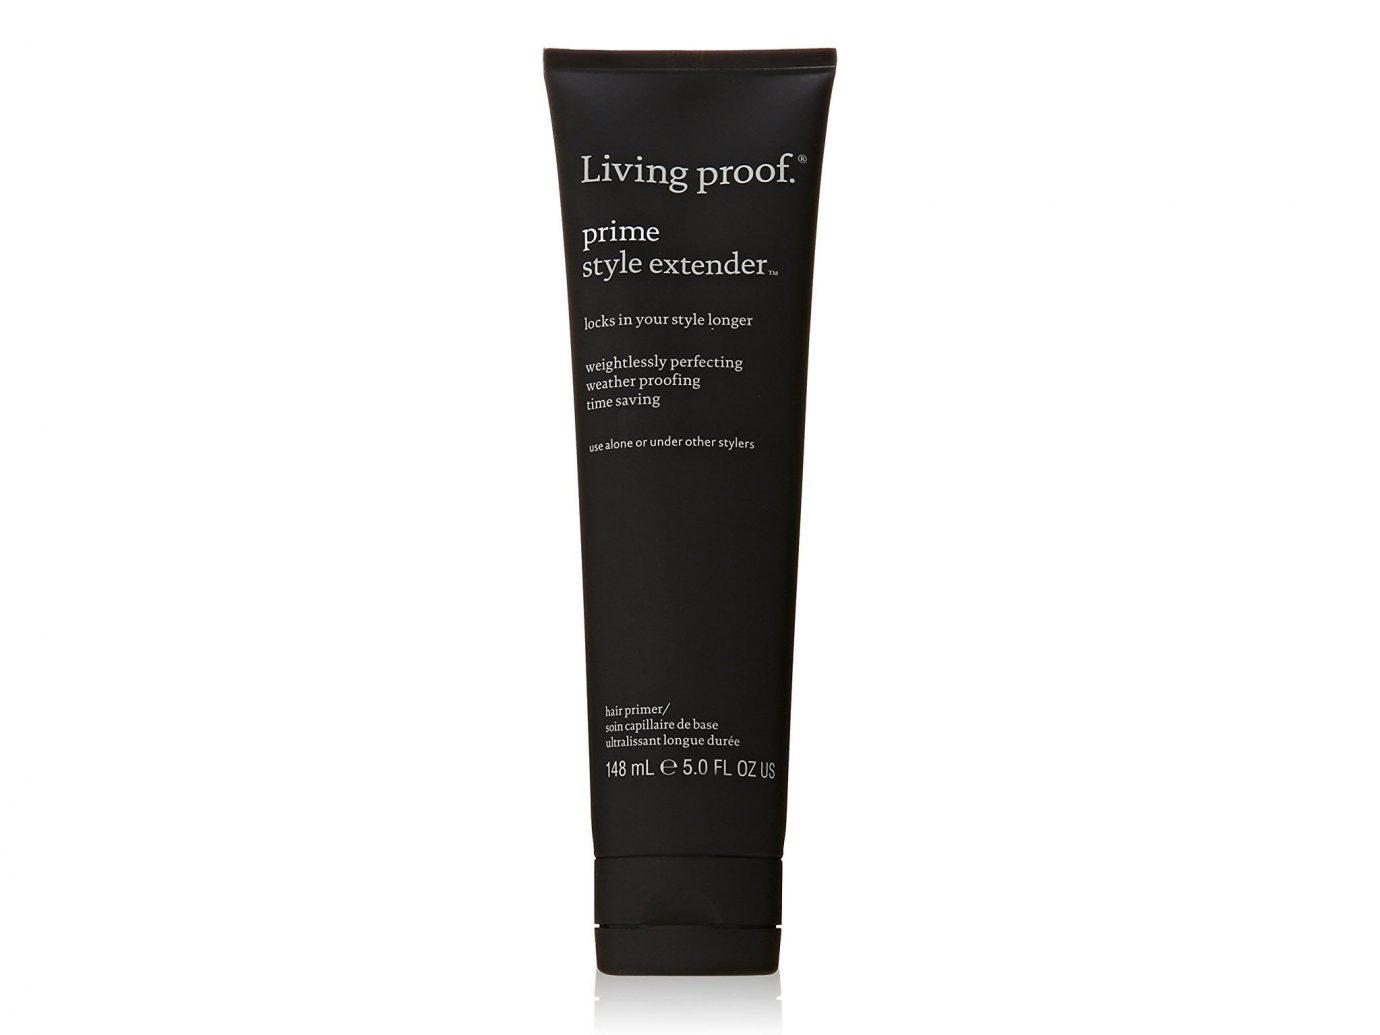 Beauty Travel Shop toiletry product skin care health & beauty cream lotion